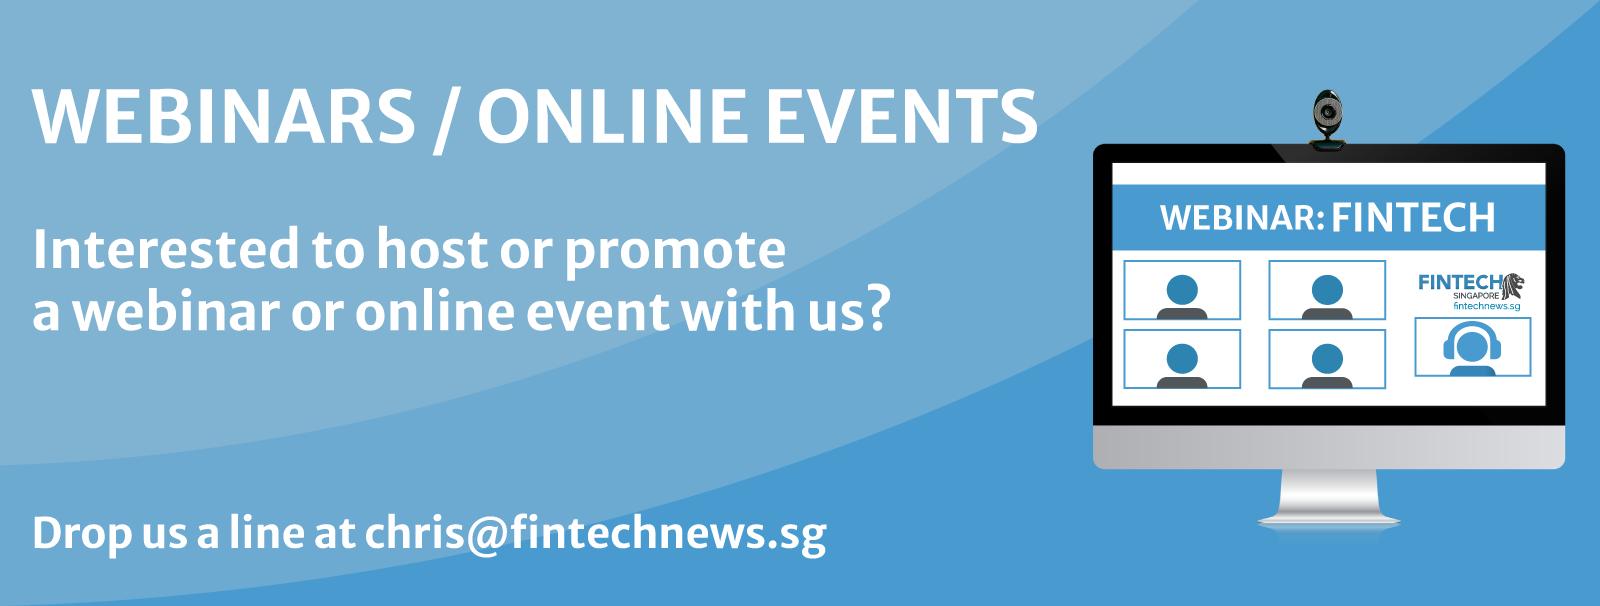 webinar events